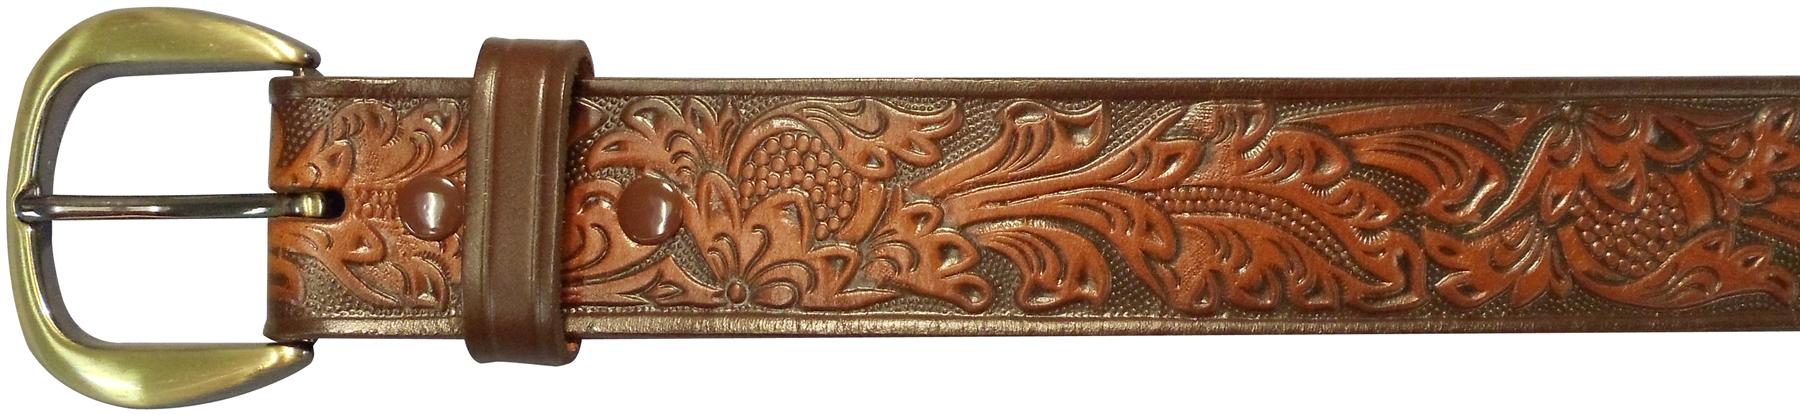 "10610110244 - 44"" Brown Leather Embossed Belt"